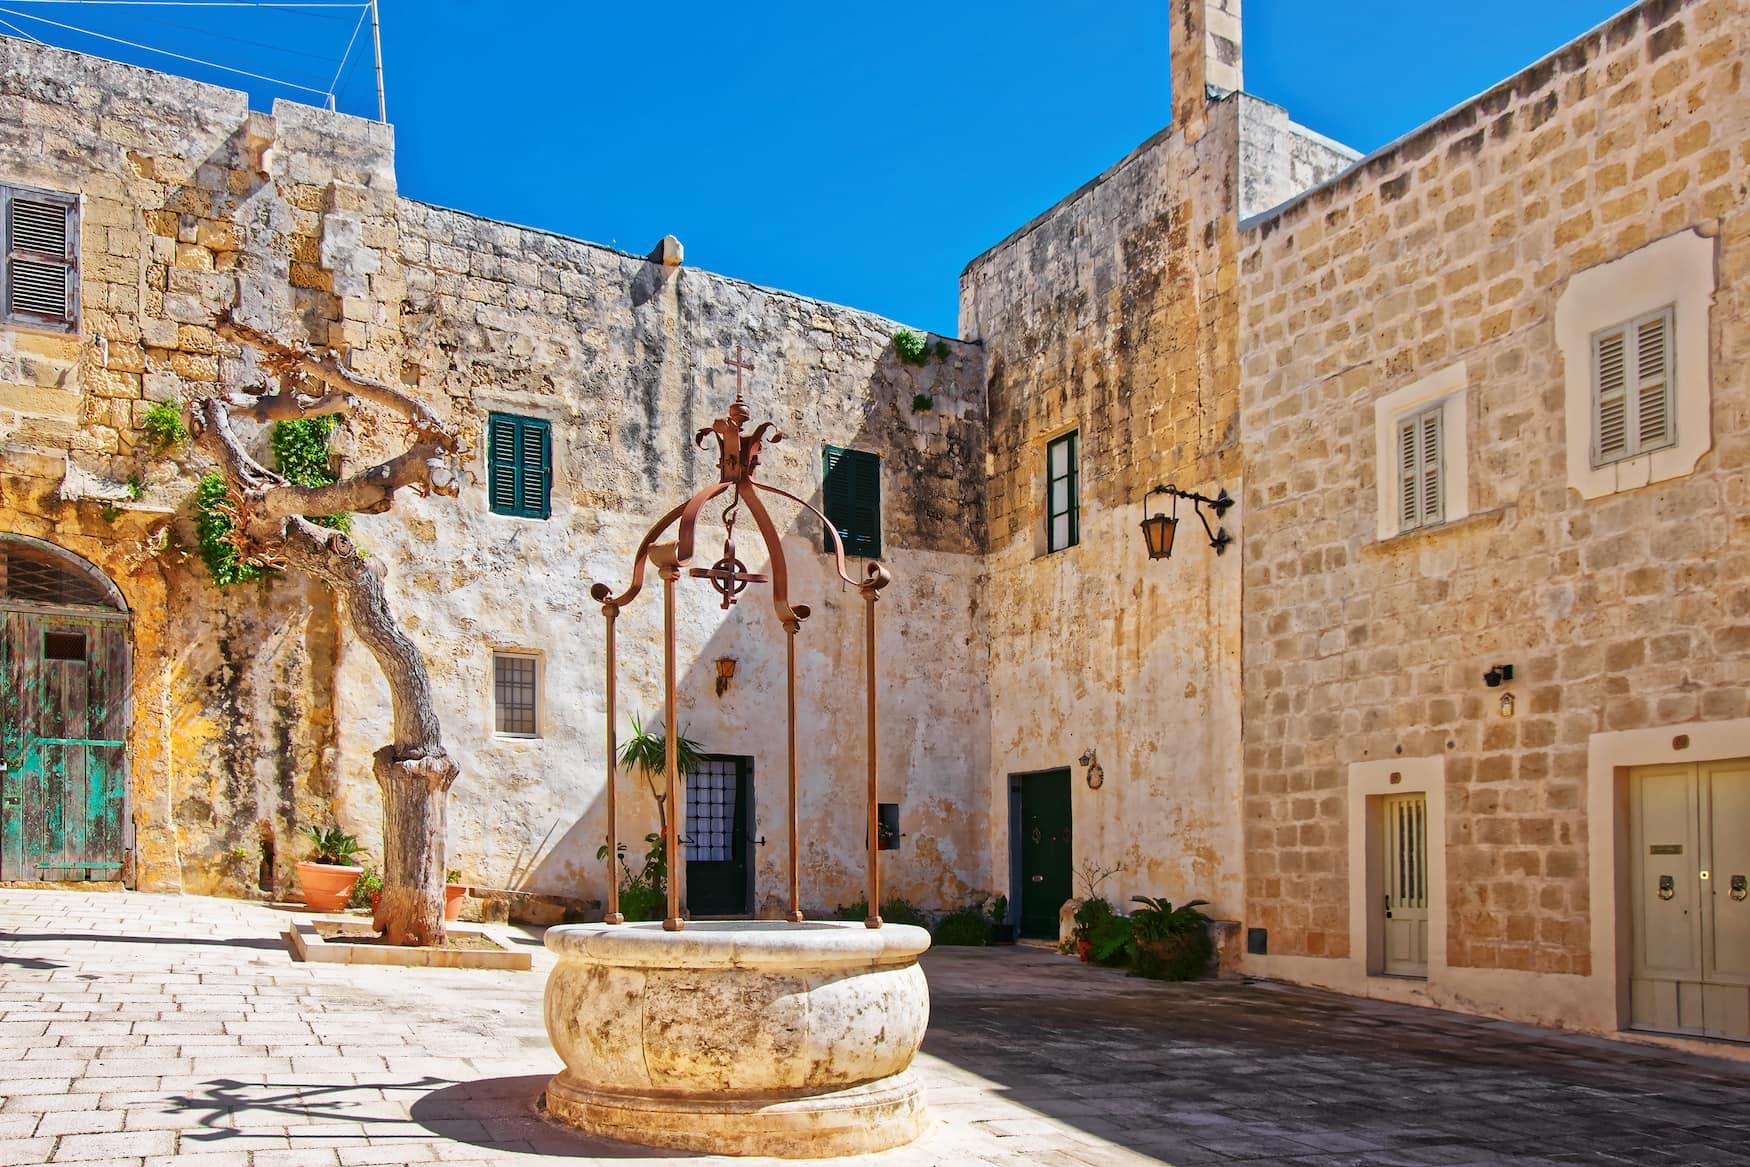 Misrah Mesquita Platz in Mdina, Malta